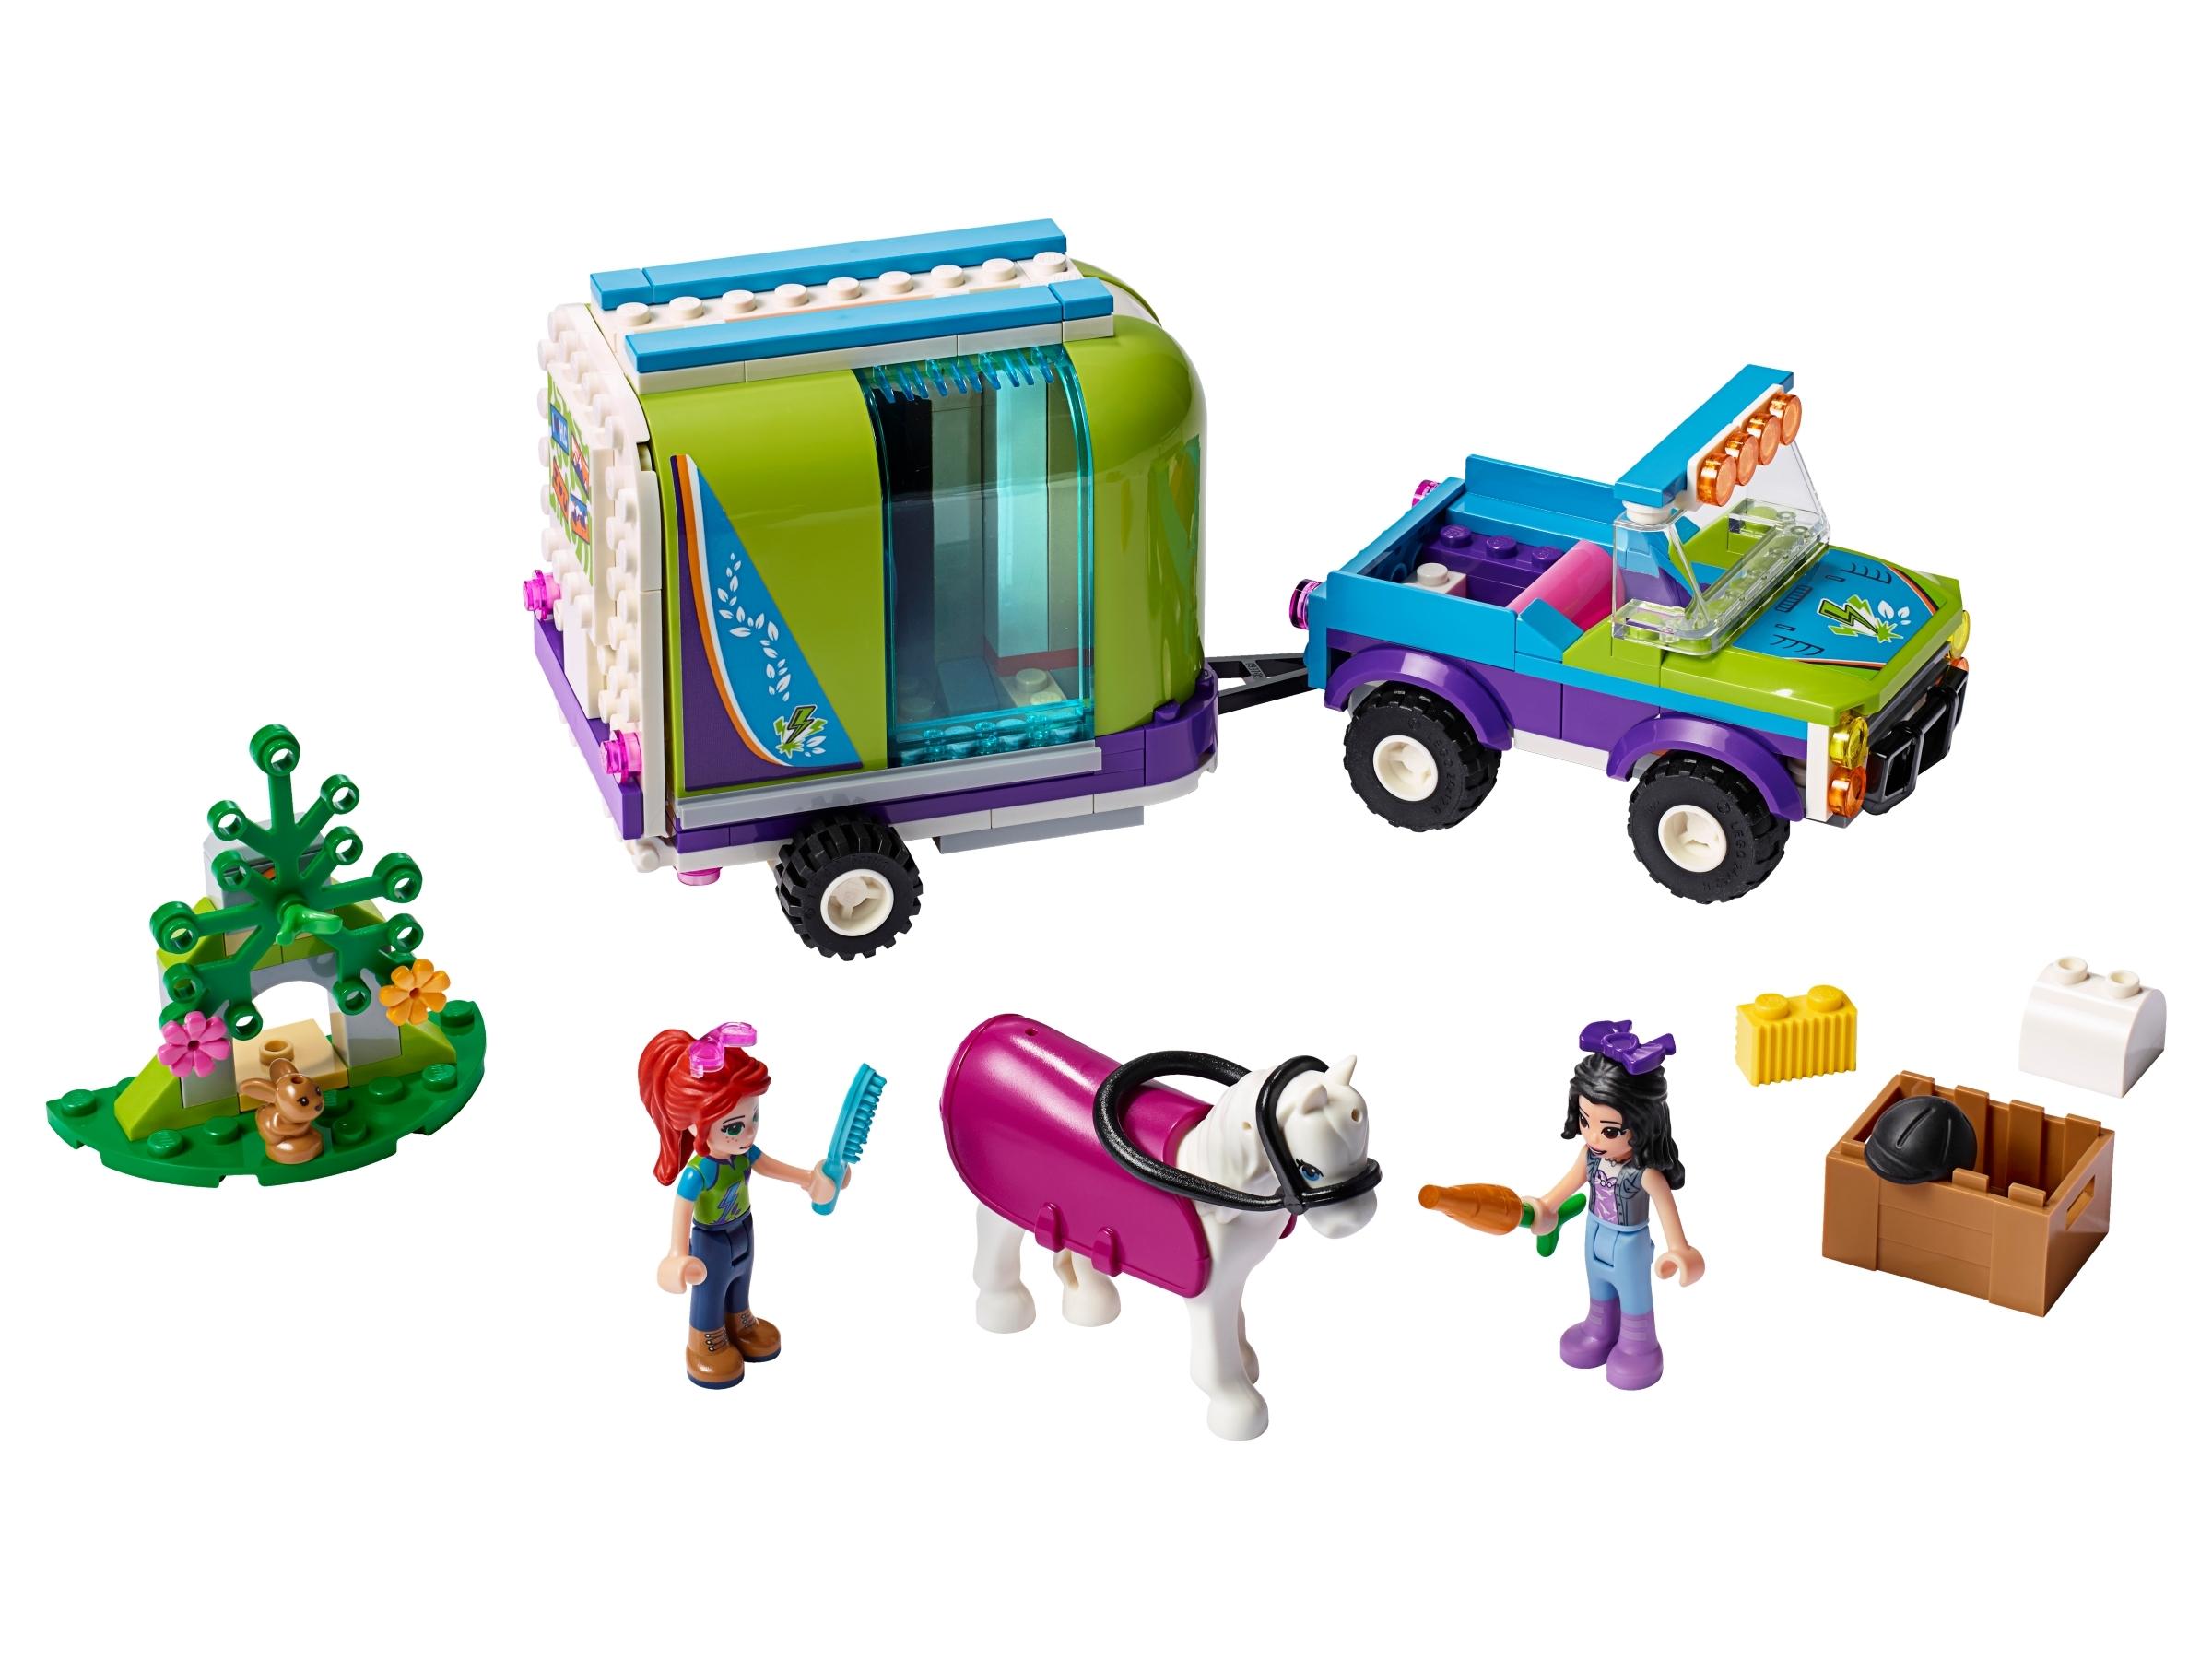 LEGO Friends 41371 Mias hästtransport